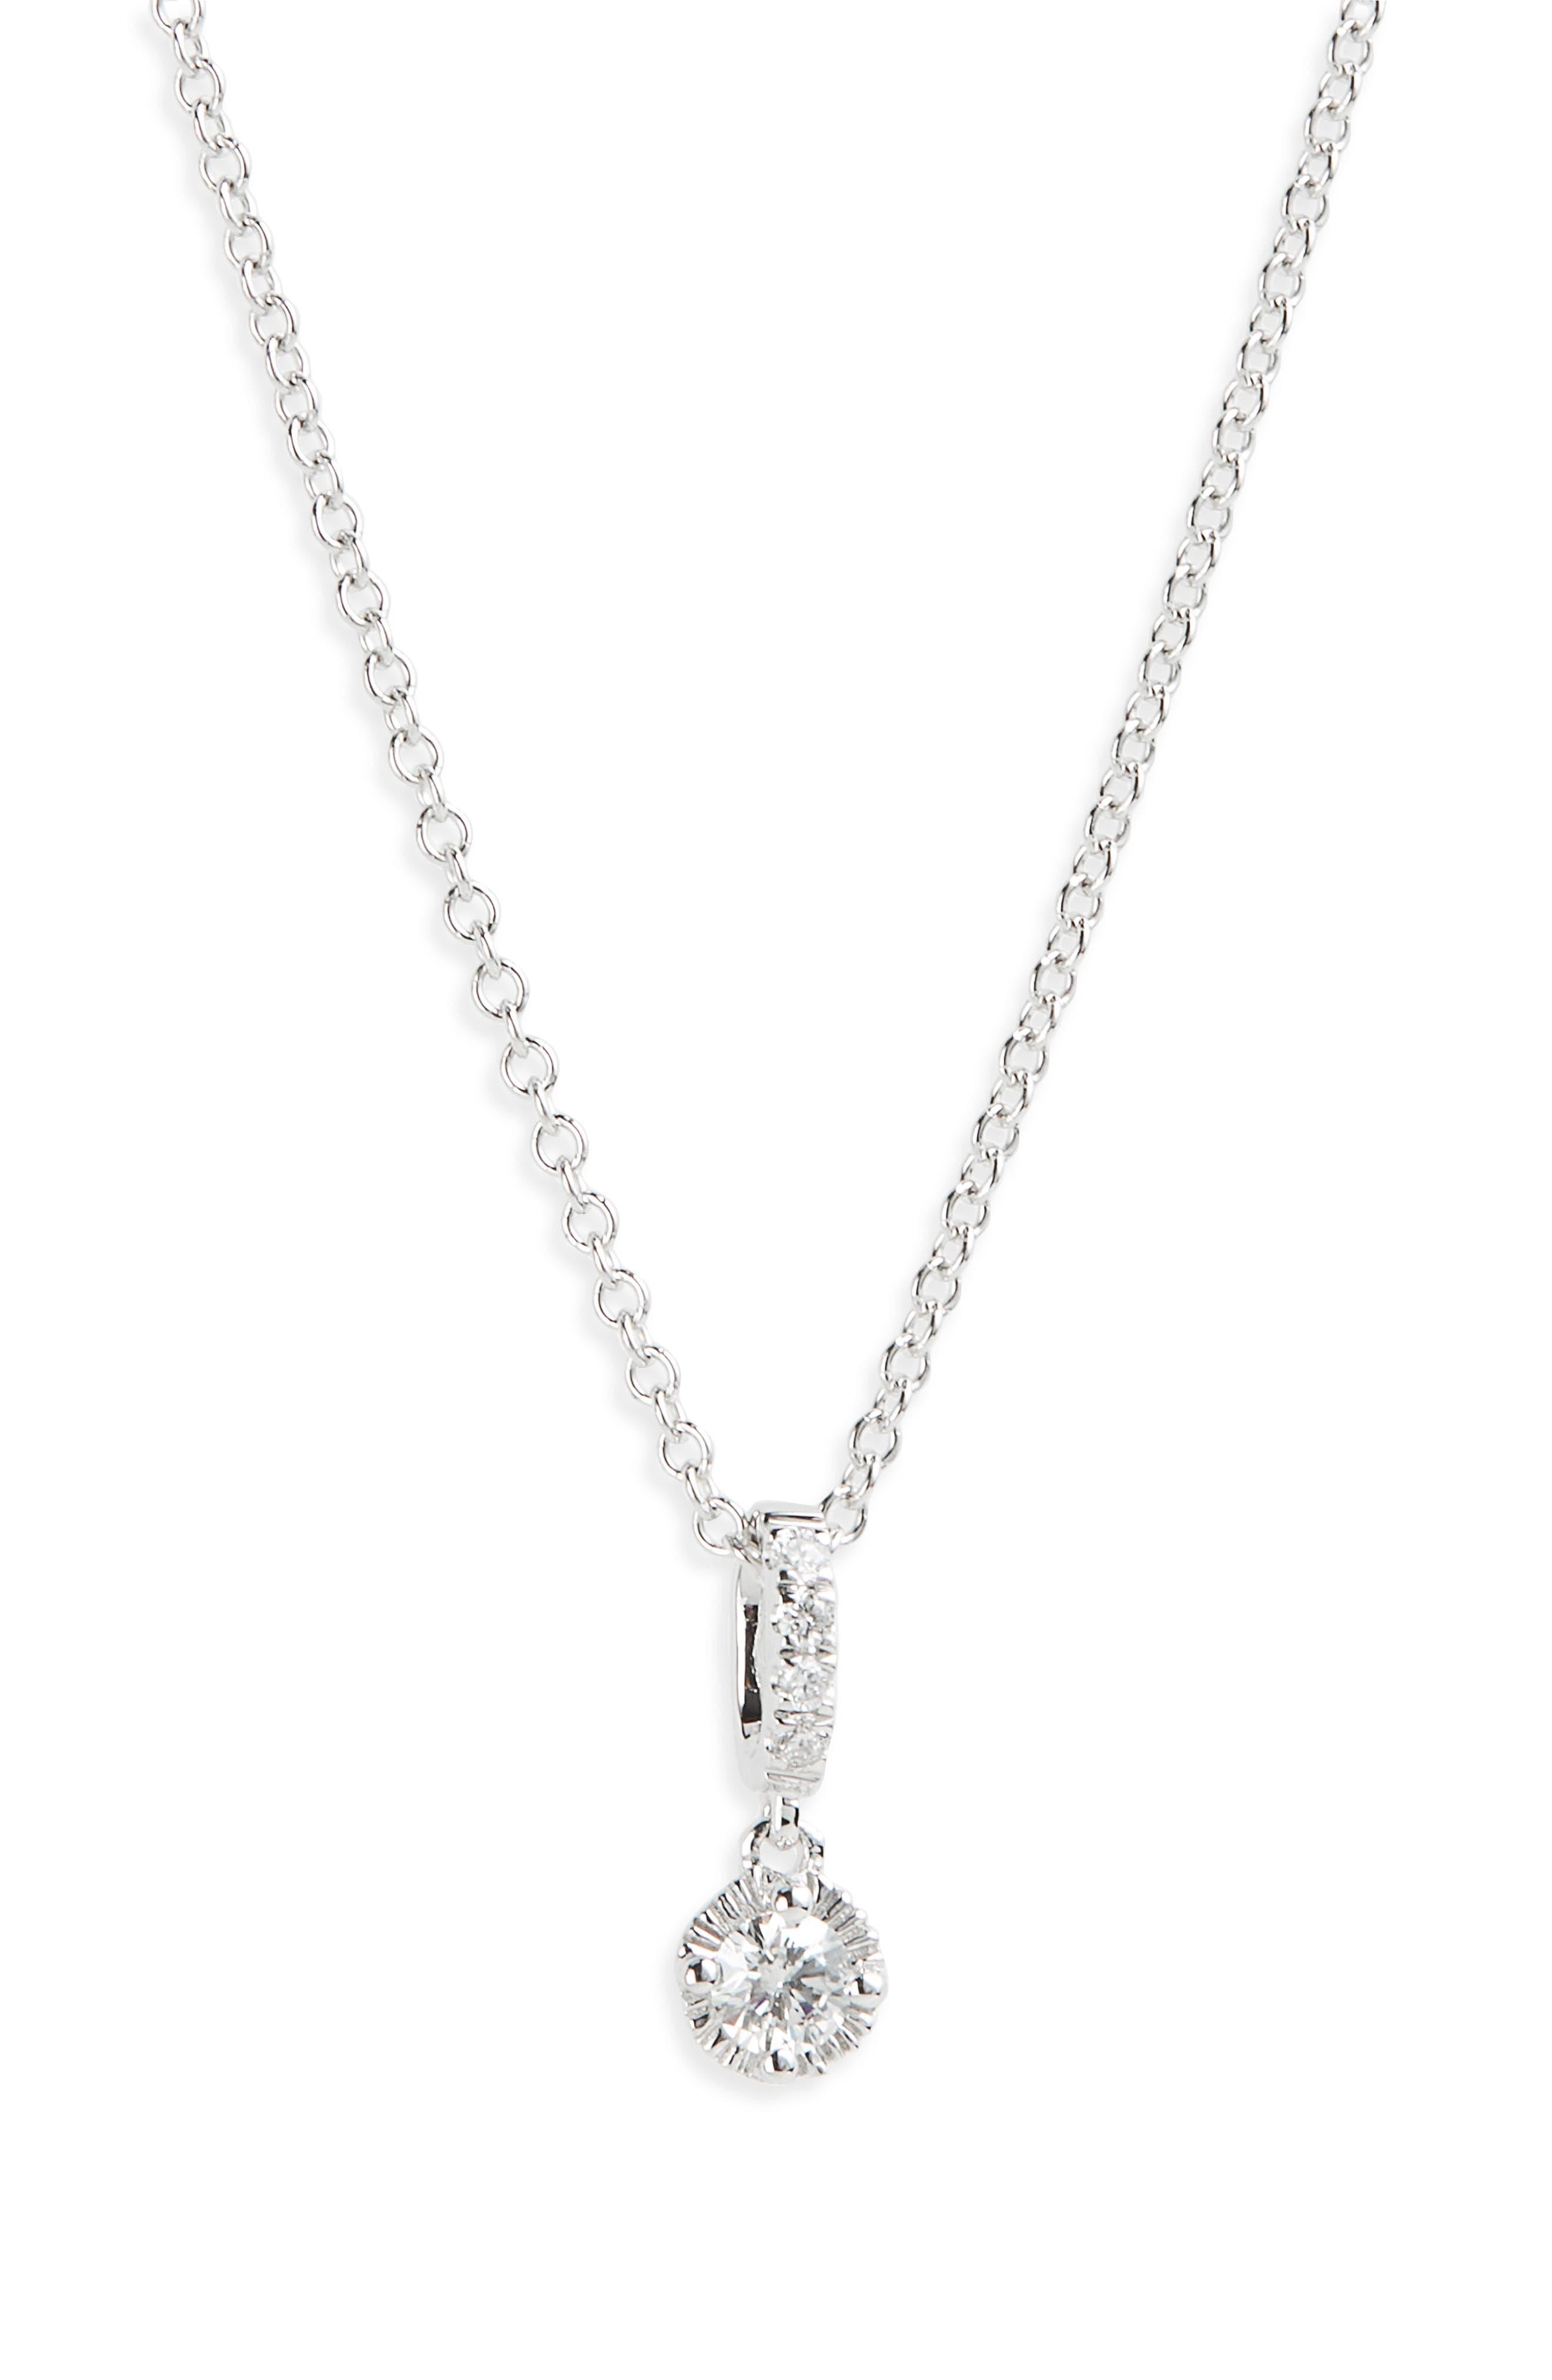 Mila Diamond Pendant Necklace,                         Main,                         color, WHITE GOLD